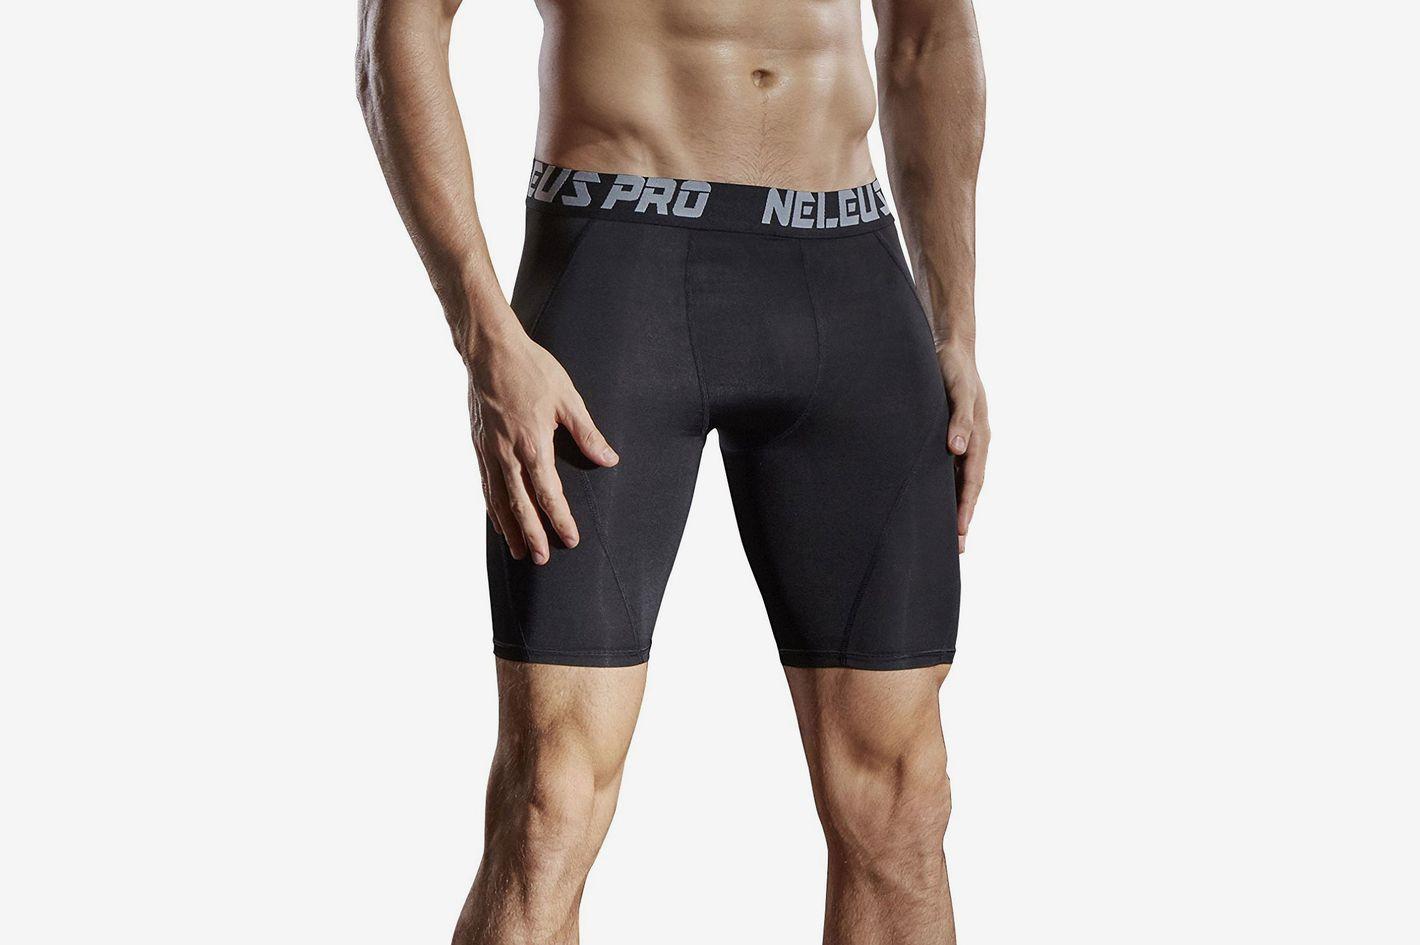 f0ca34134d Neleus Men's 3 Pack Sport Compression Shorts